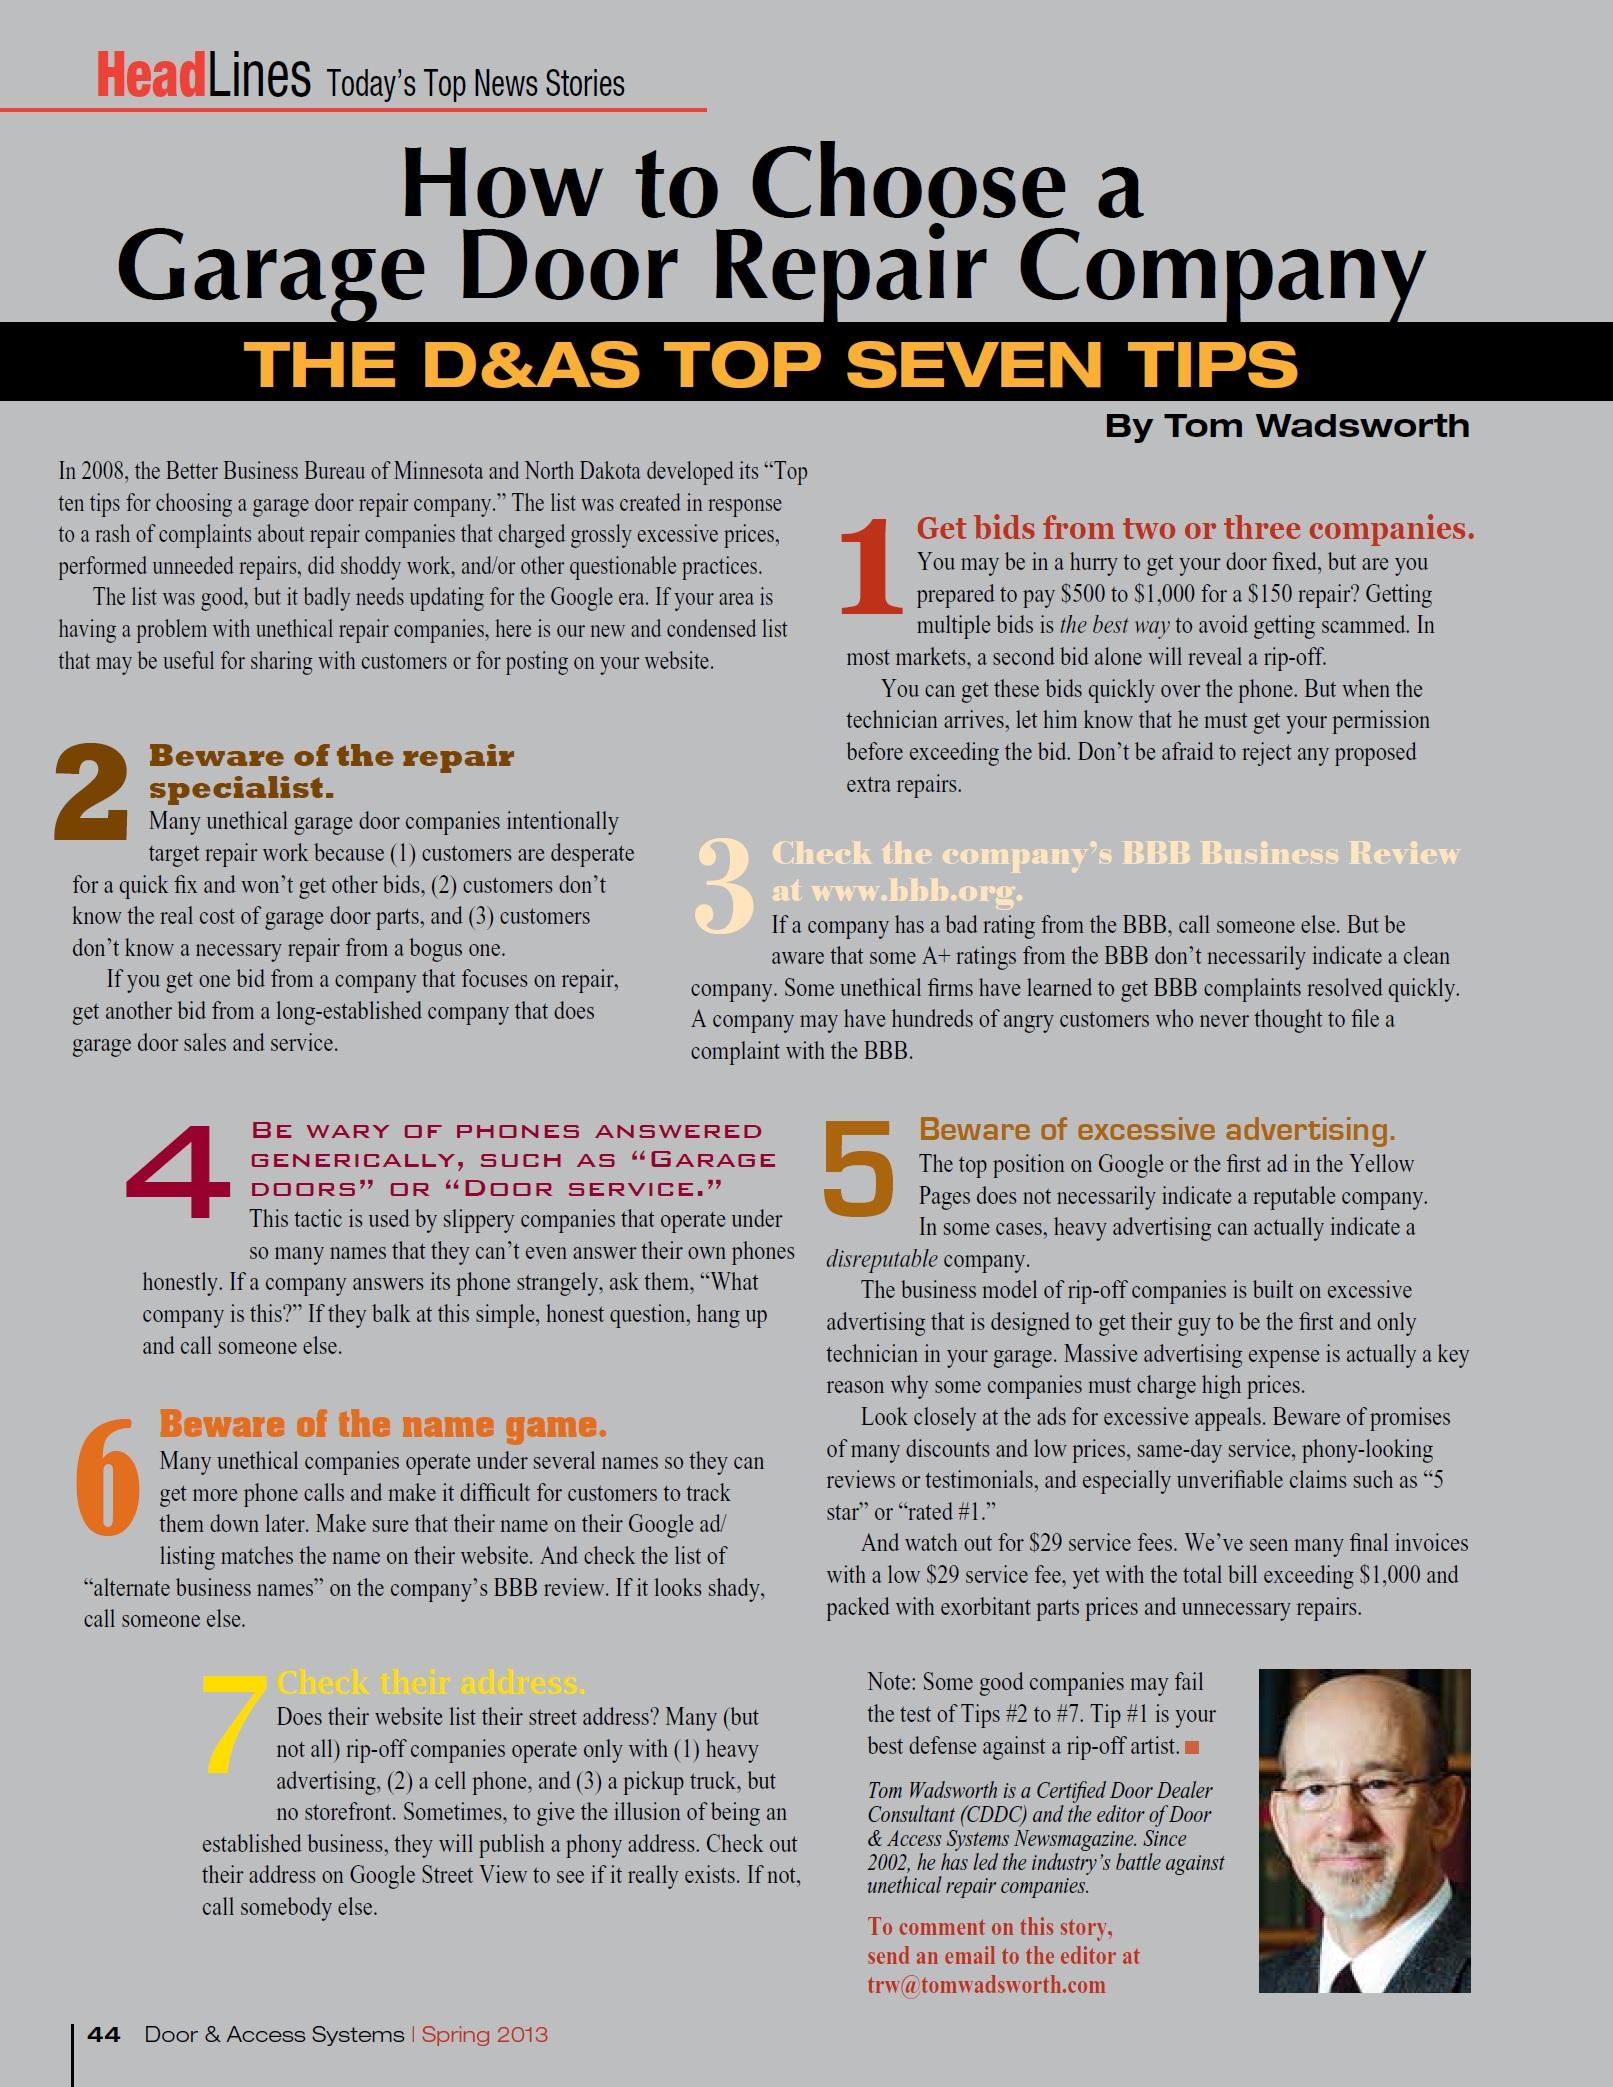 How to choose a garage door repair company (2)